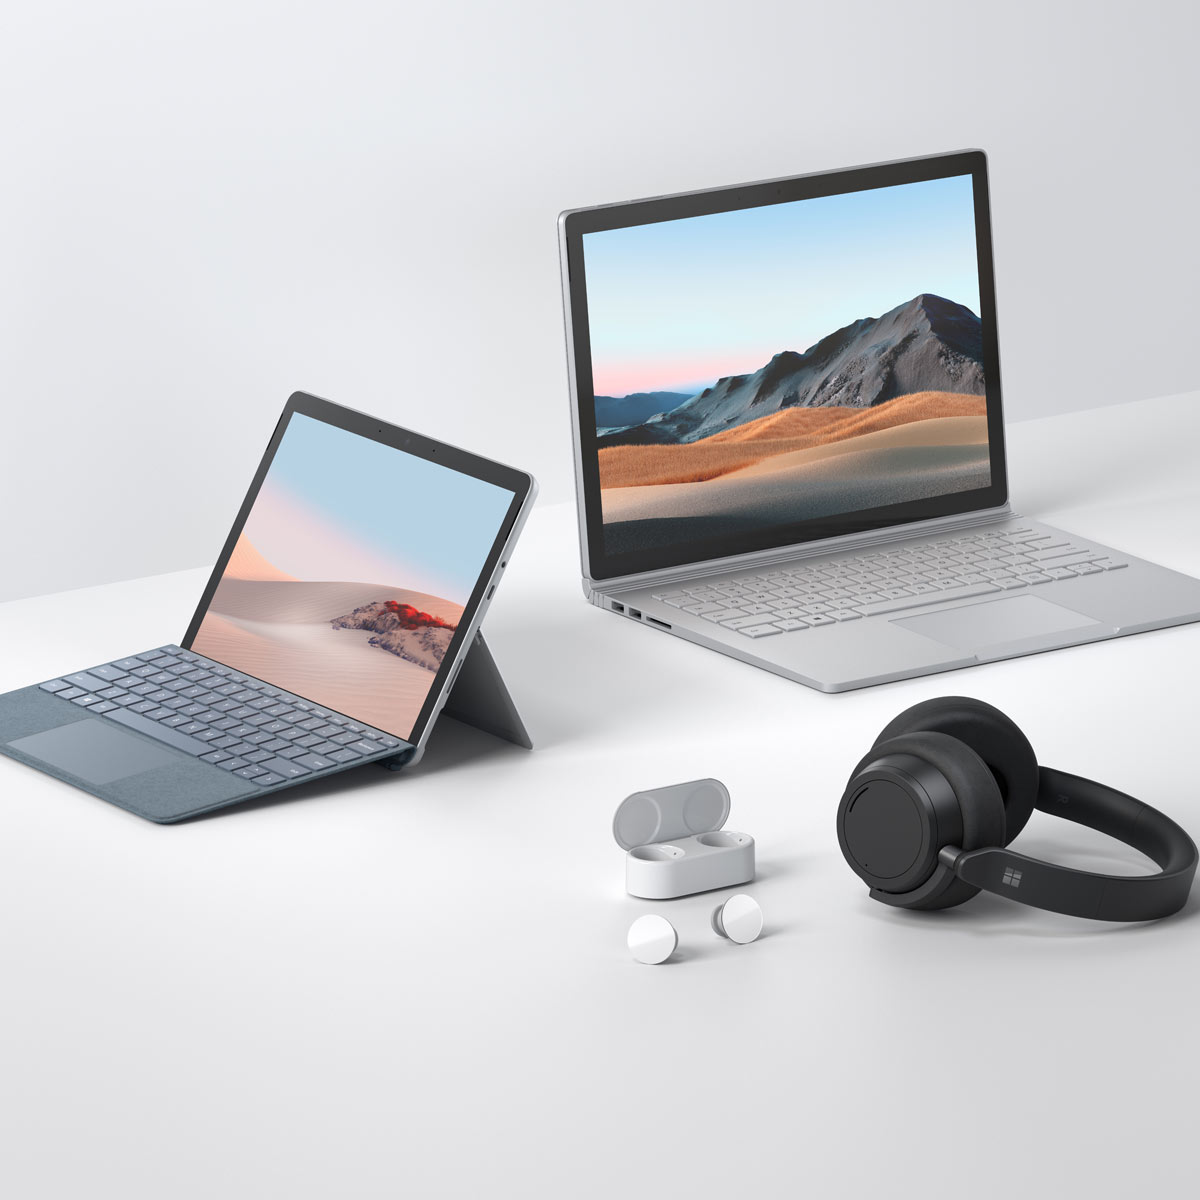 「Surface Go 2」「Surface Book 3」は在宅勤務やテレワークで働く人のよき相棒